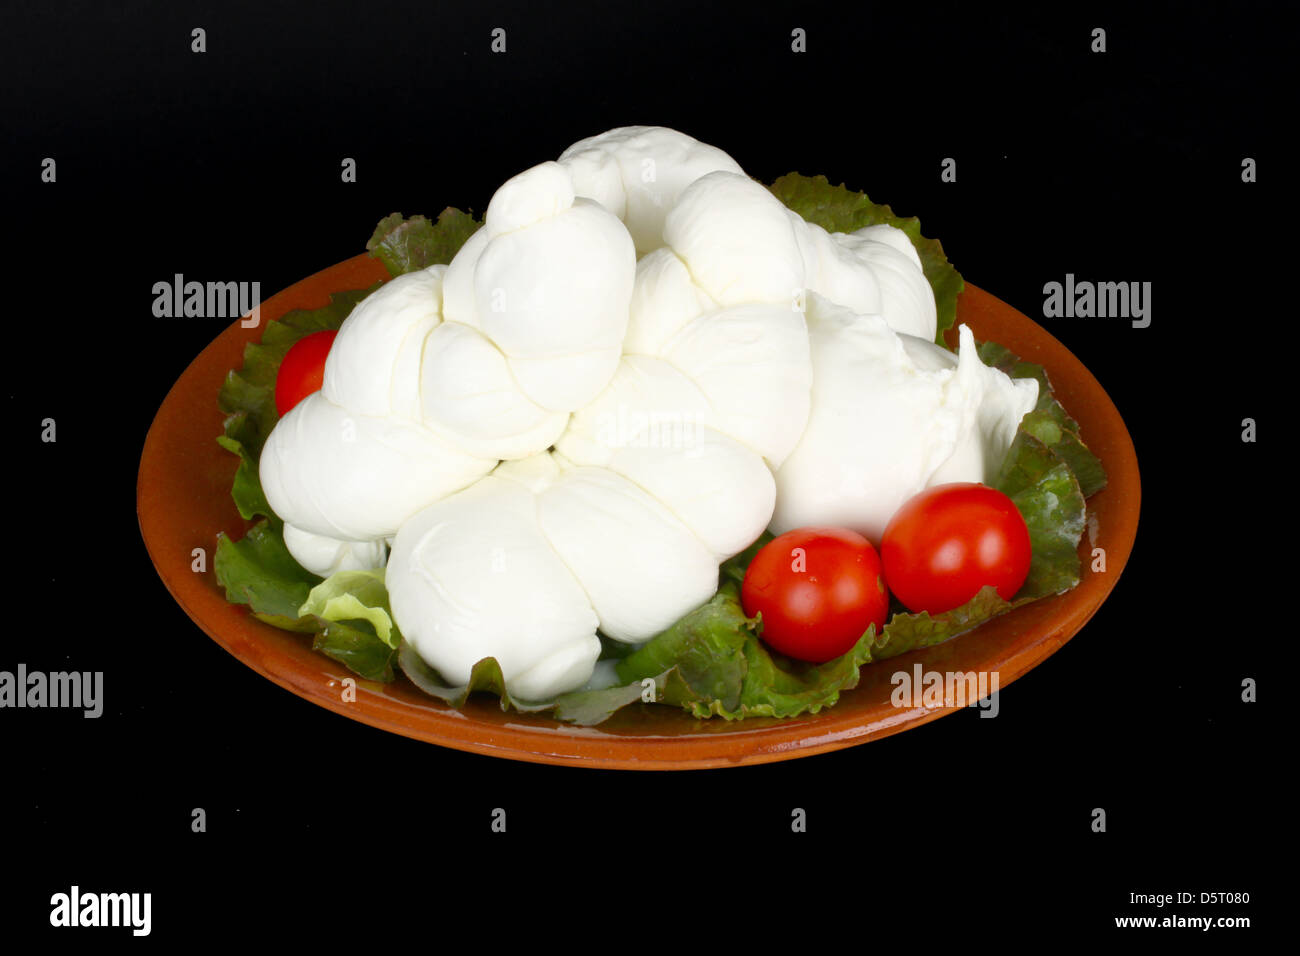 Braid of Italian mozzarella with salad and tomatoes - Stock Image